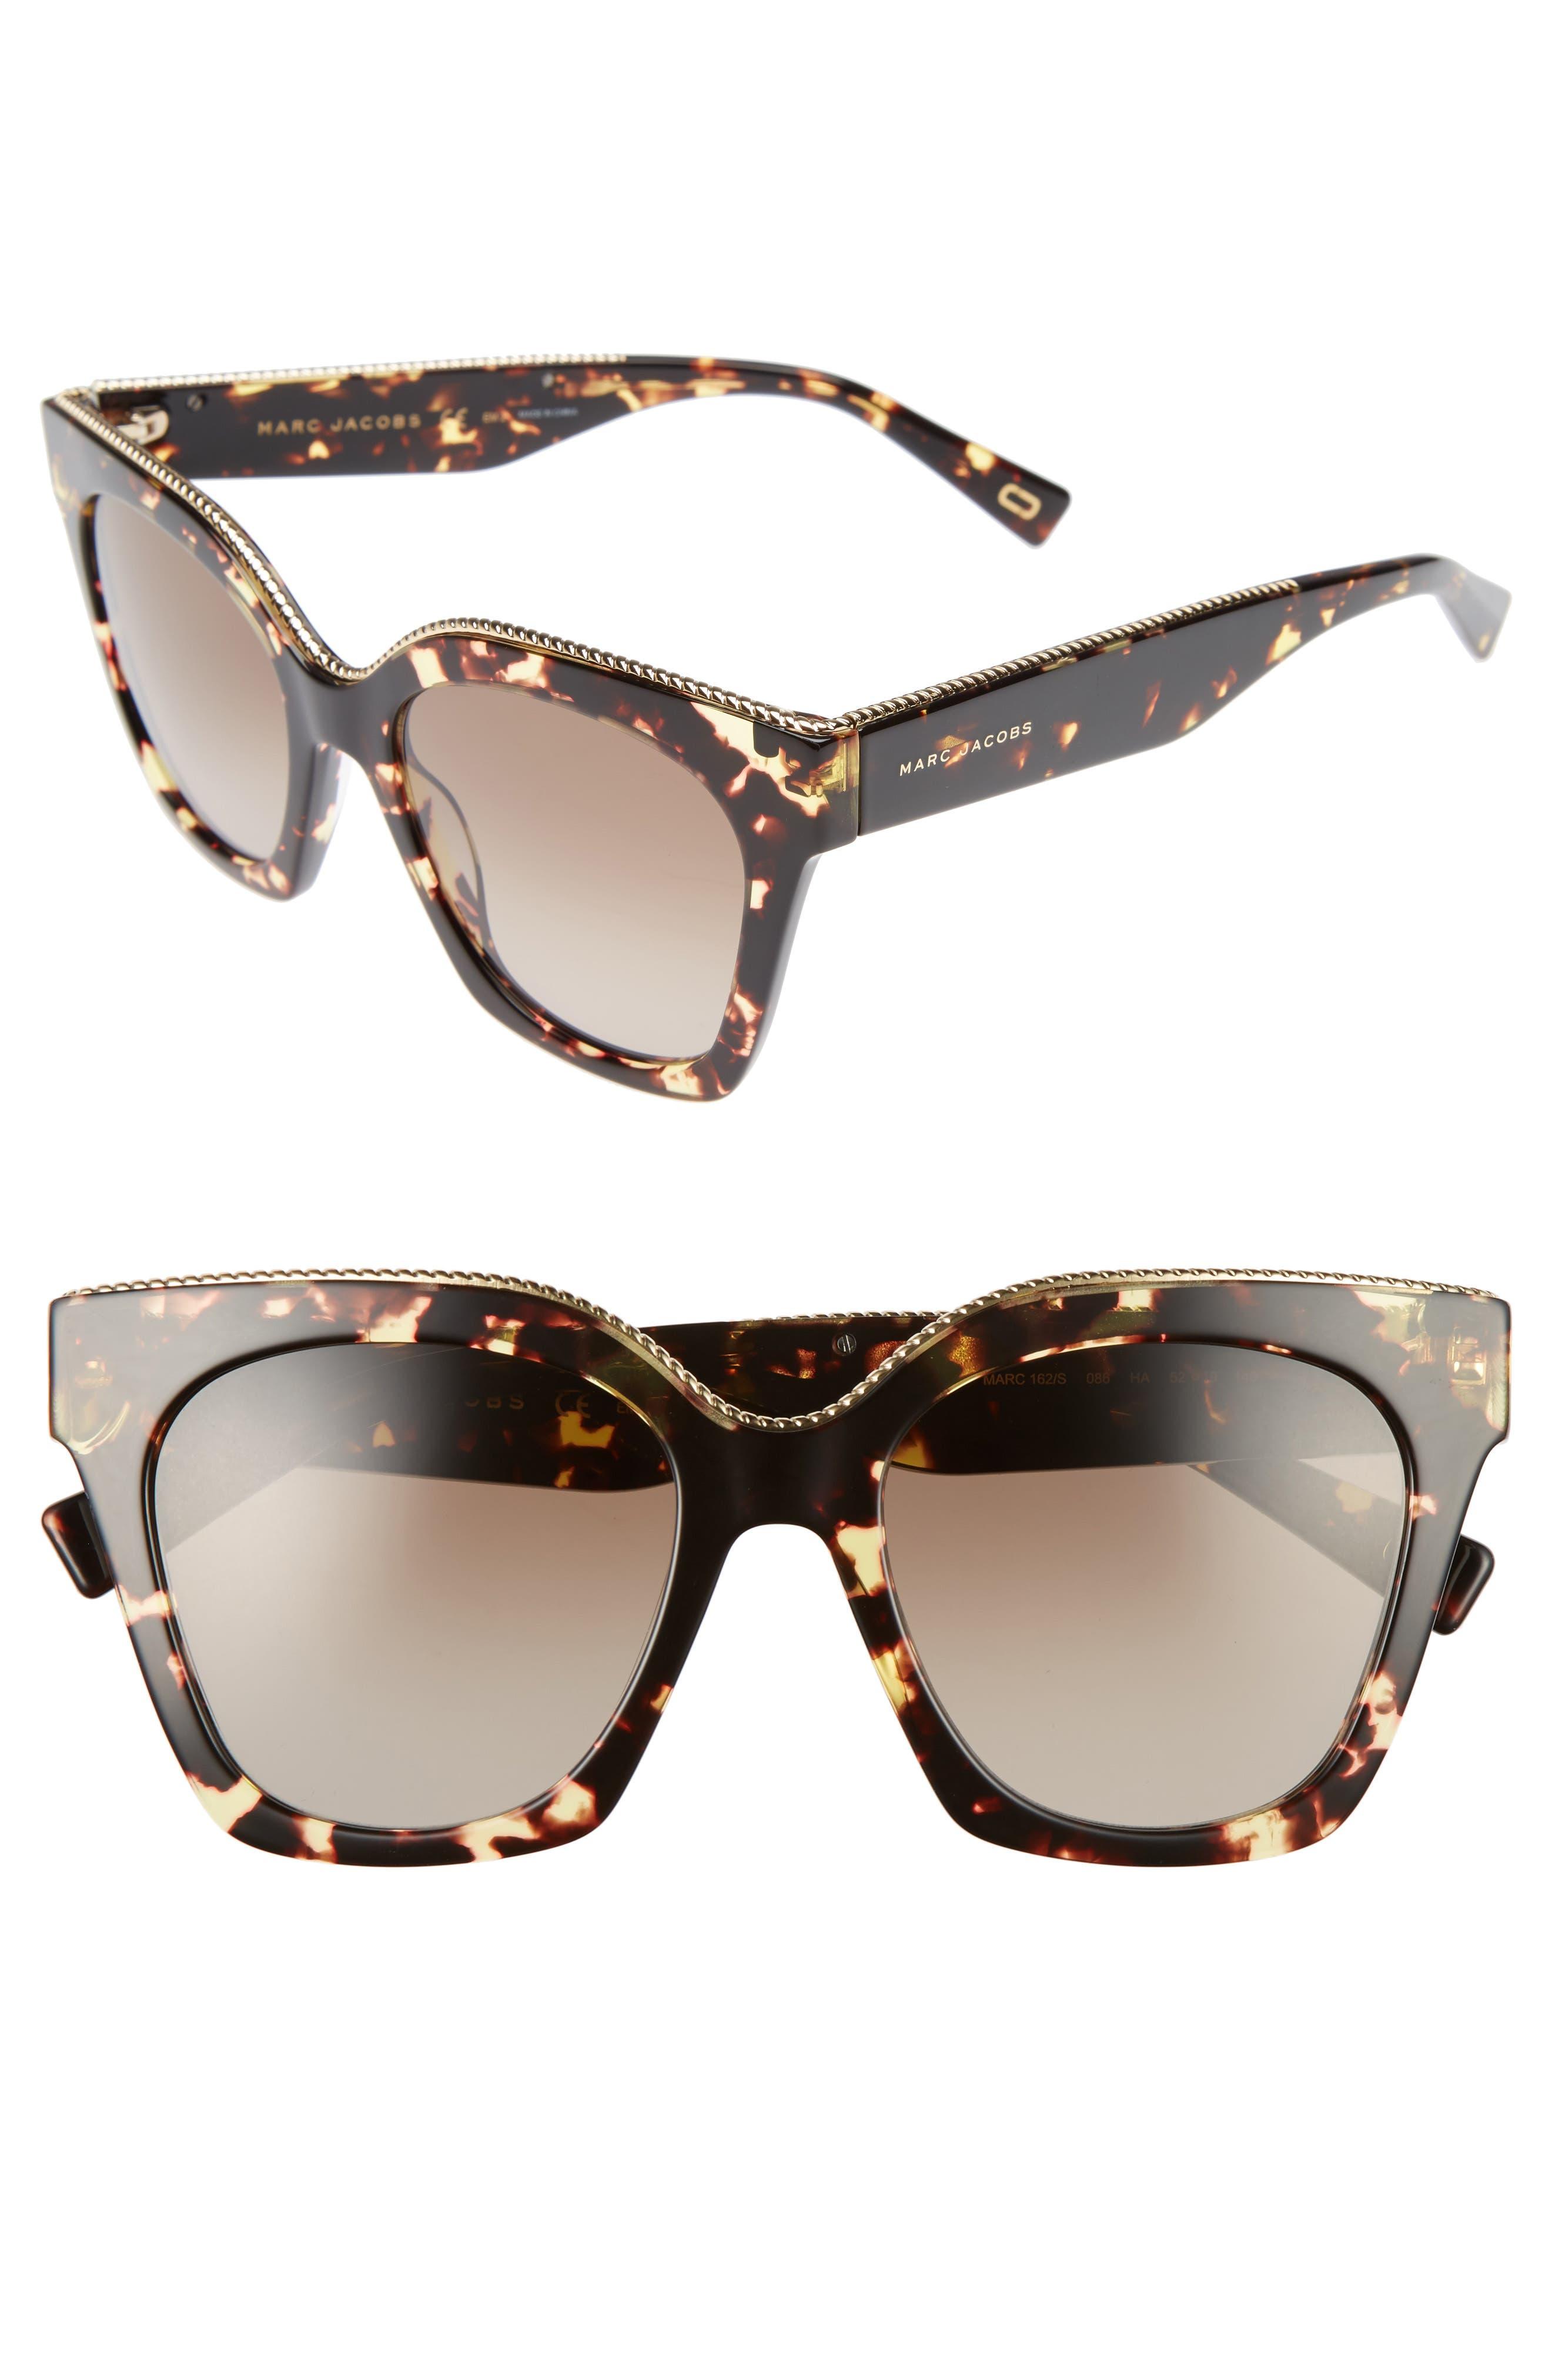 52mm Square Sunglasses,                         Main,                         color, Dark Havana